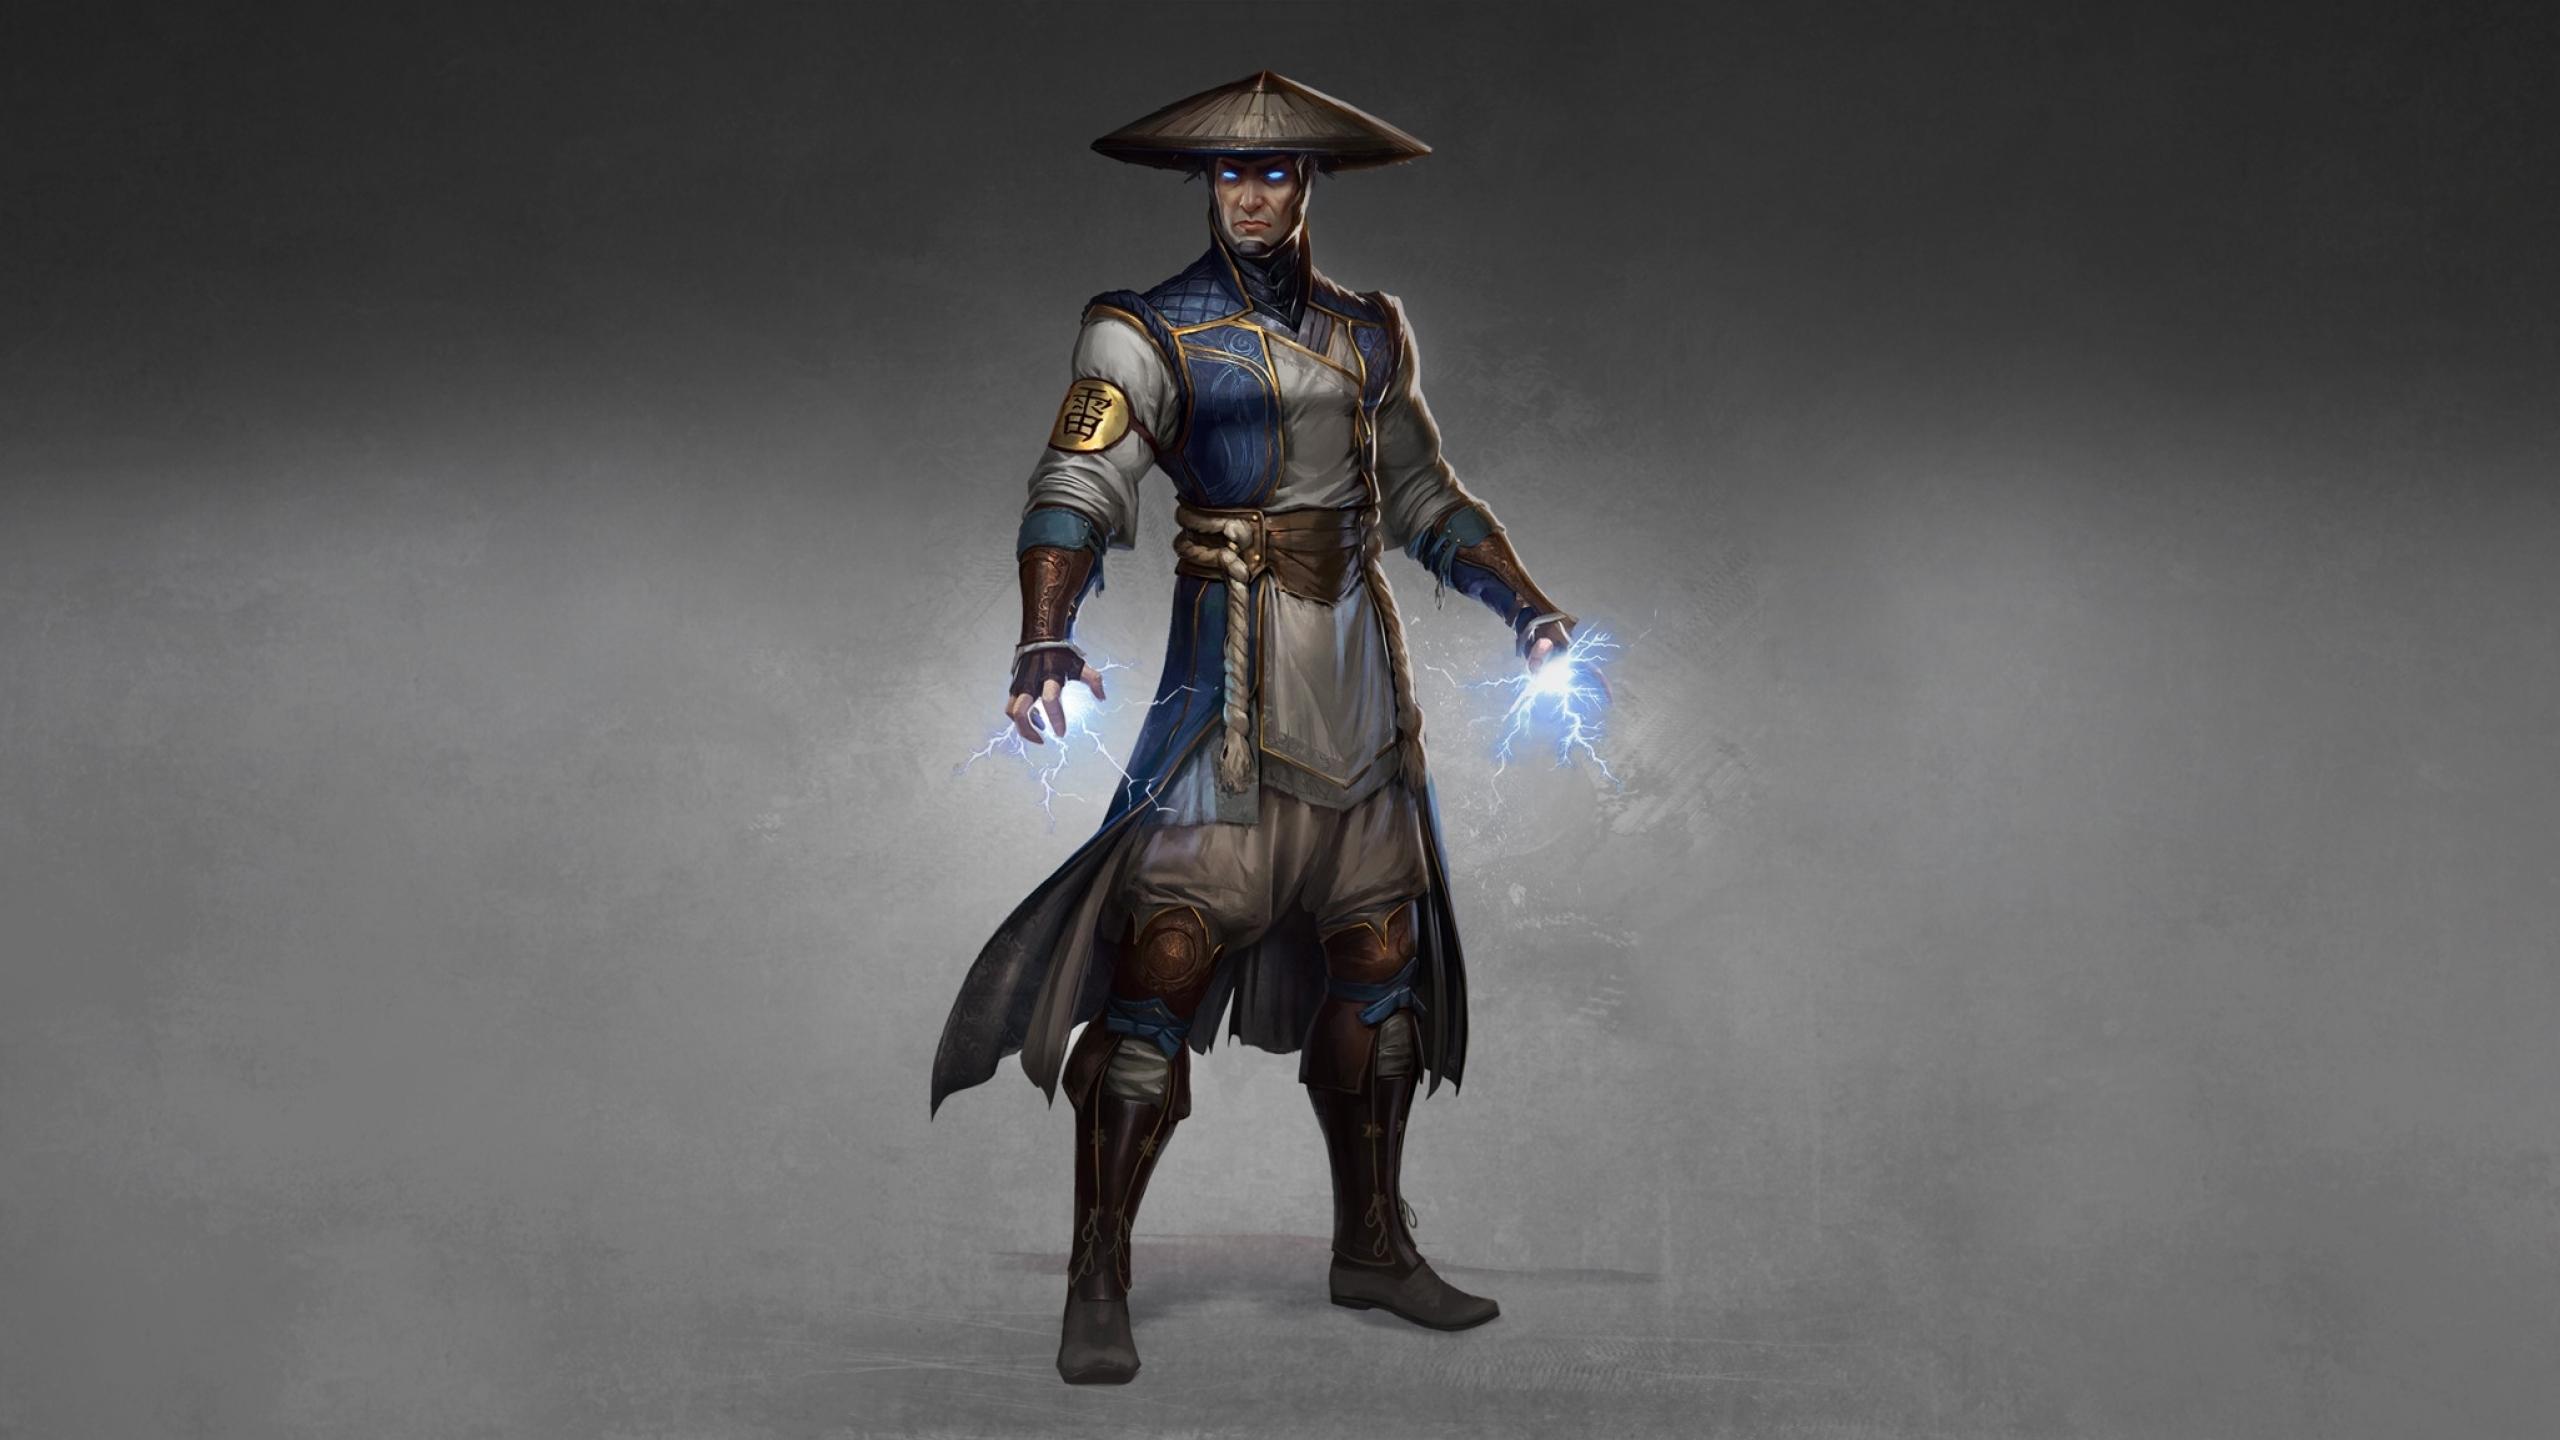 2560x1440 Raiden Mortal Kombat 1440p Resolution Wallpaper Hd